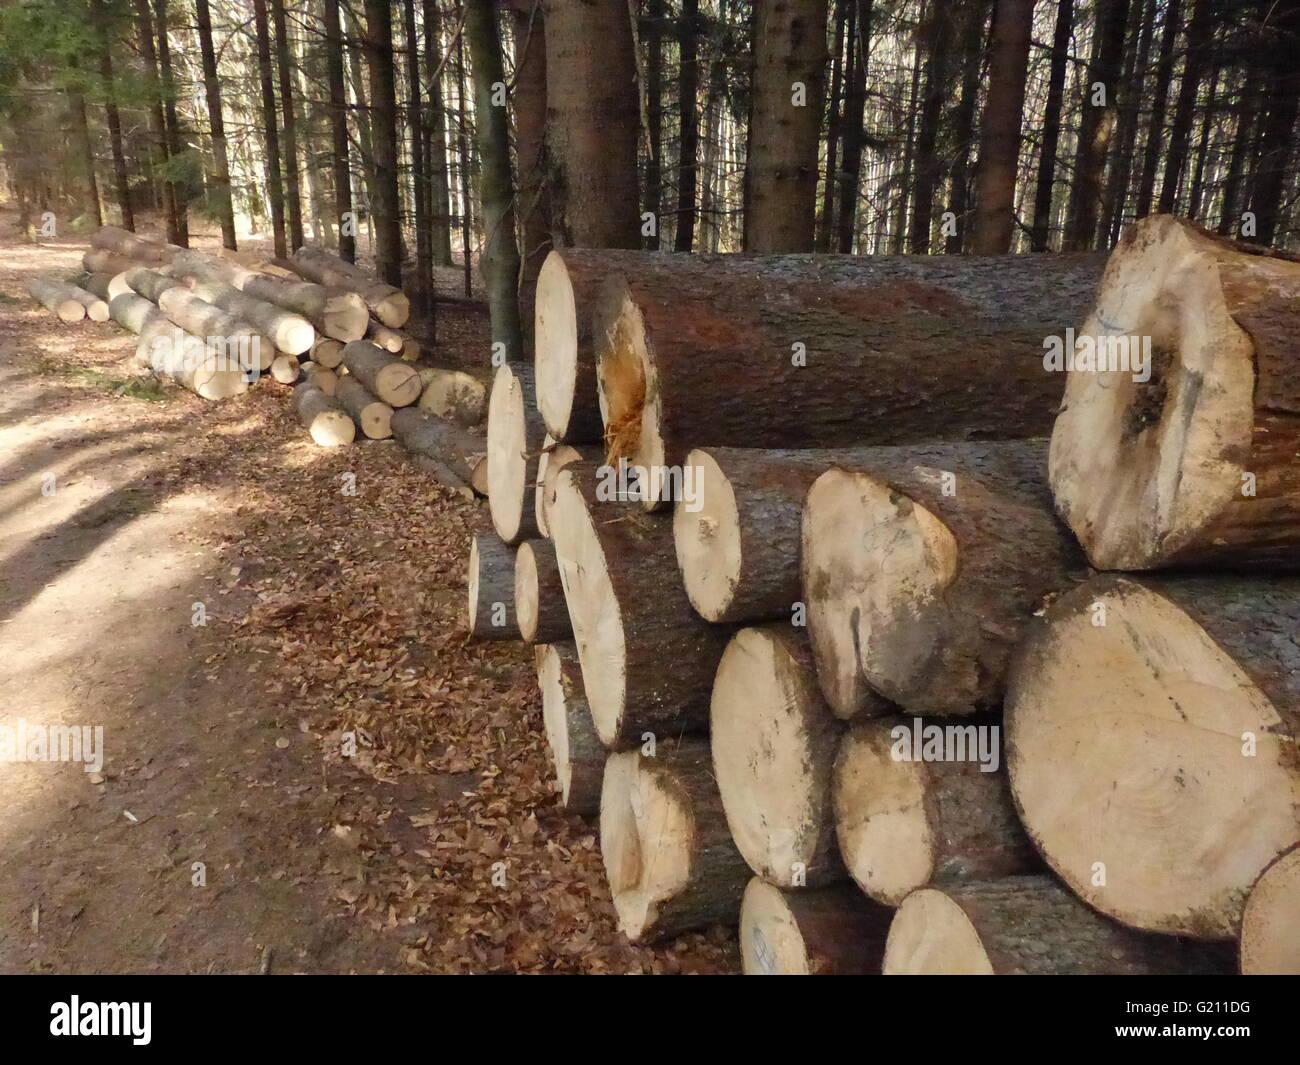 spruce, harvested, damaged, bark beetle, waste - Stock Image